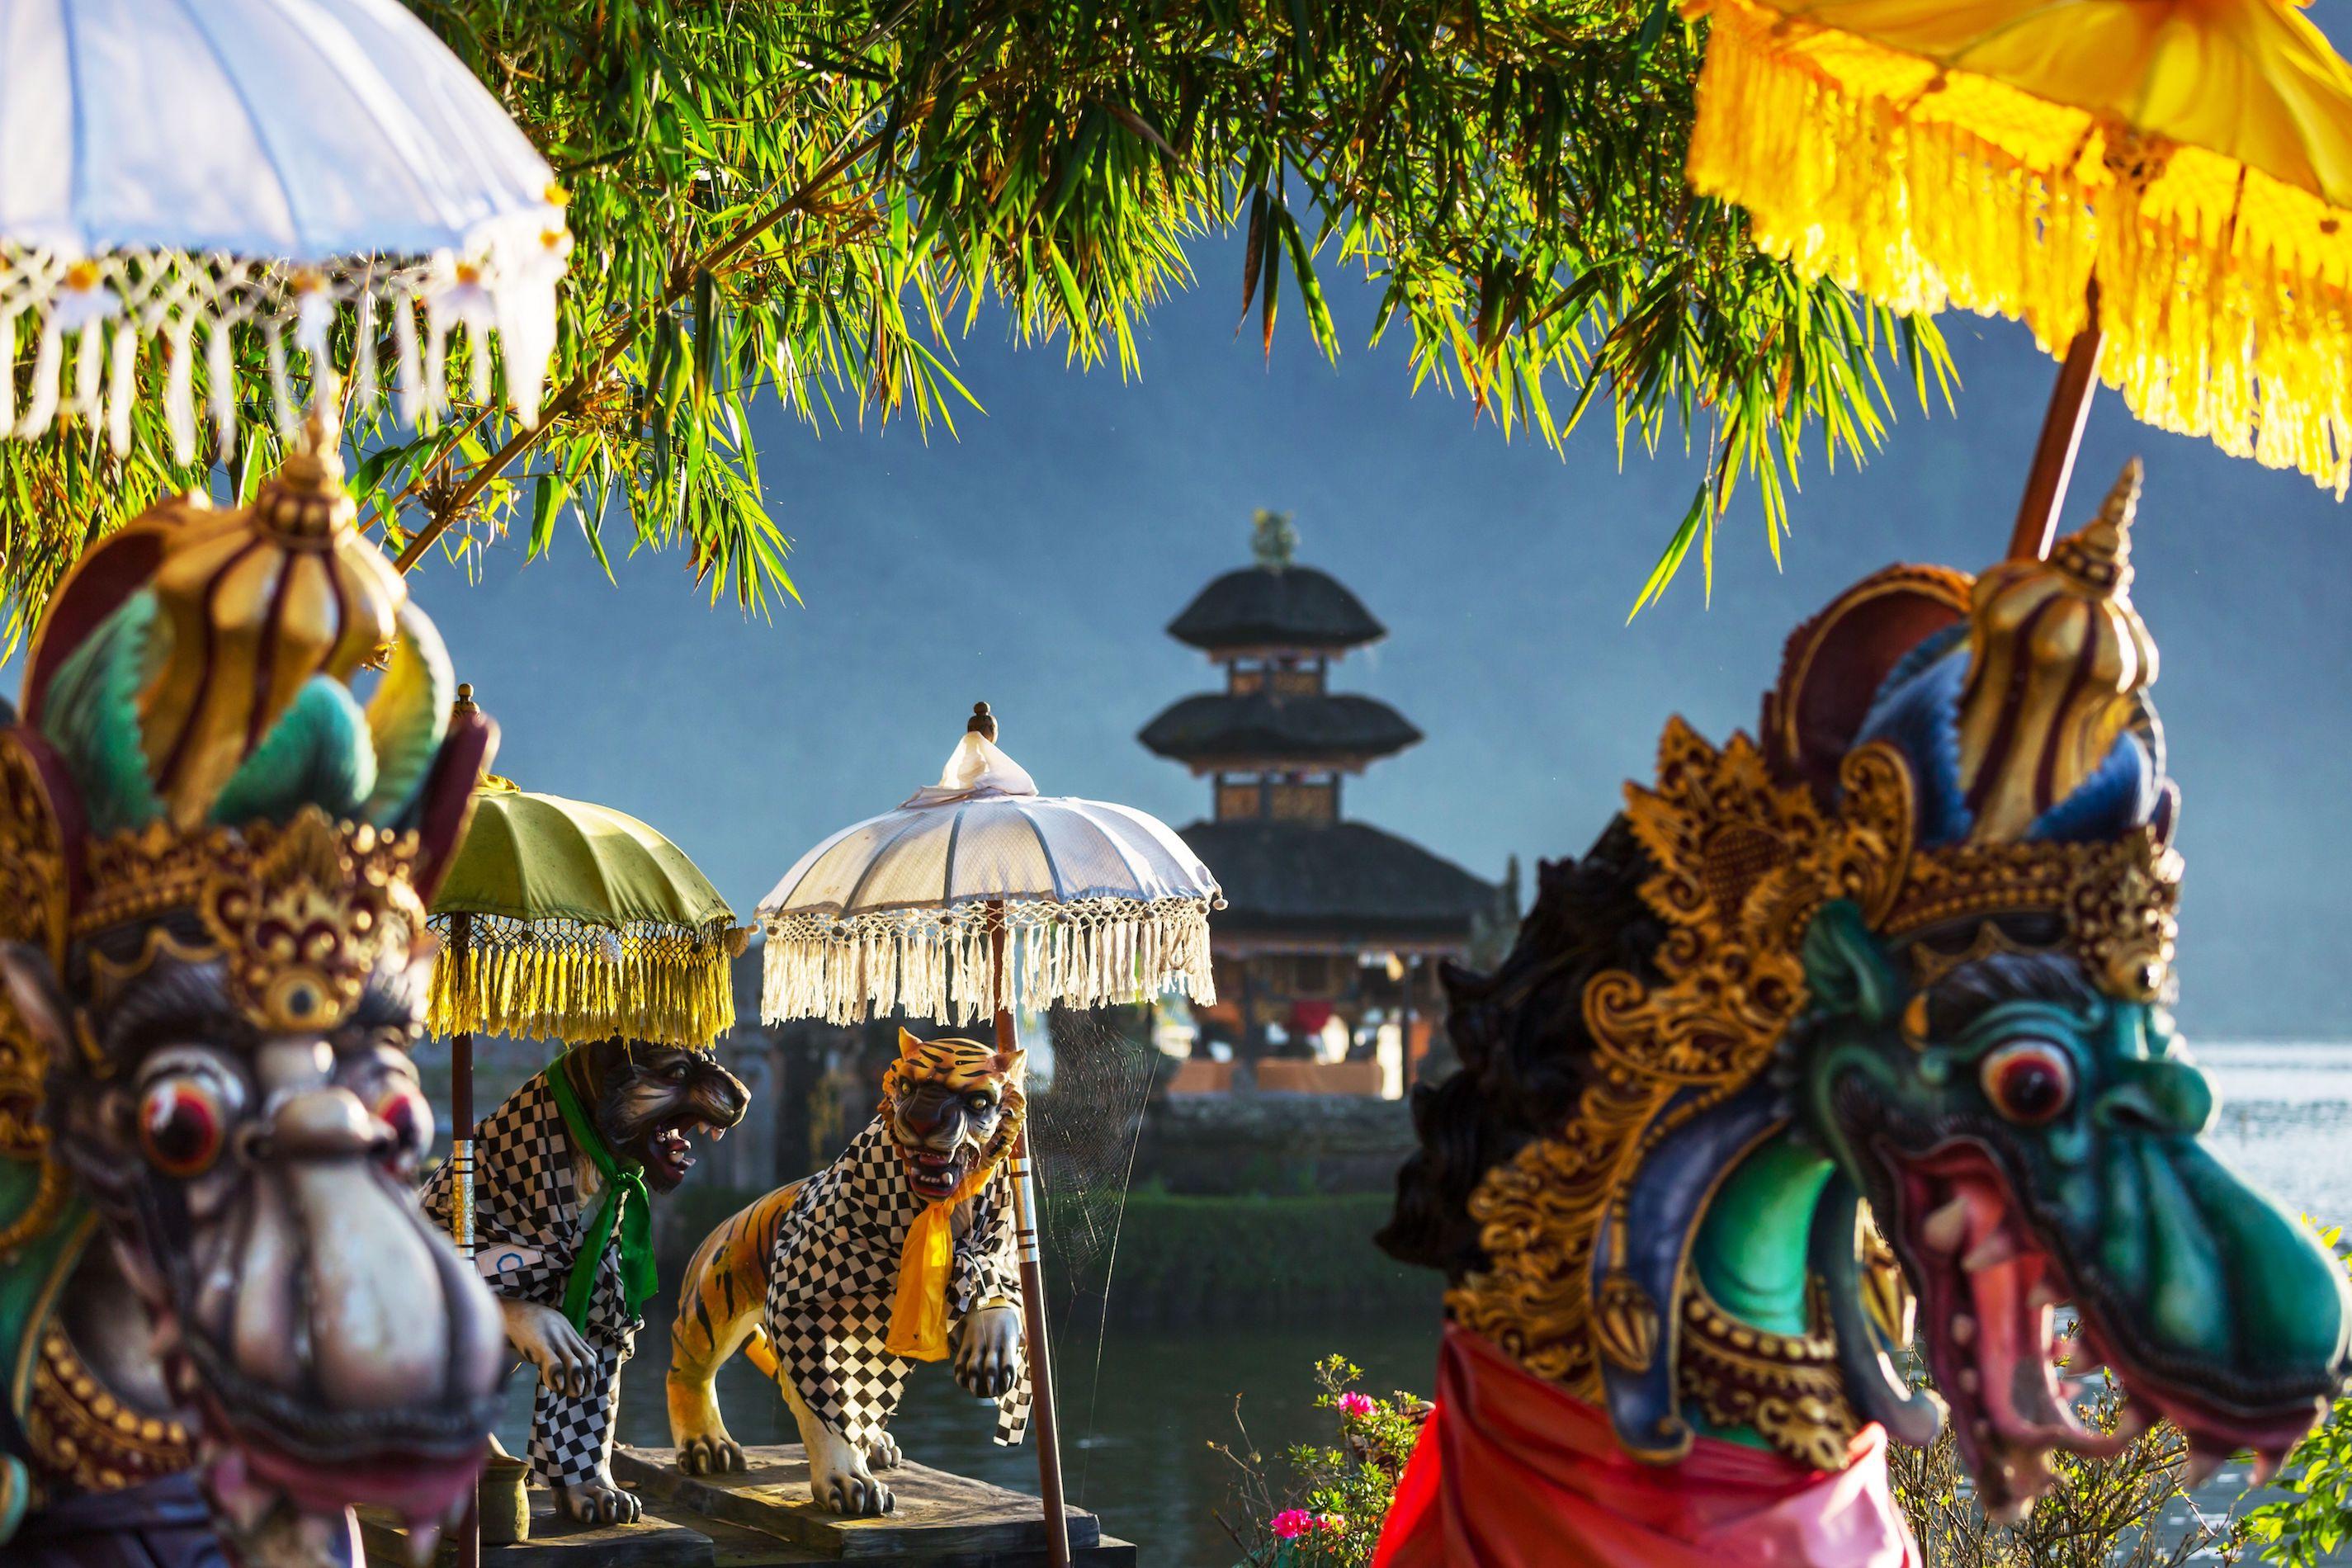 Tempio Pura Ulun Danu a Bali Indonesia